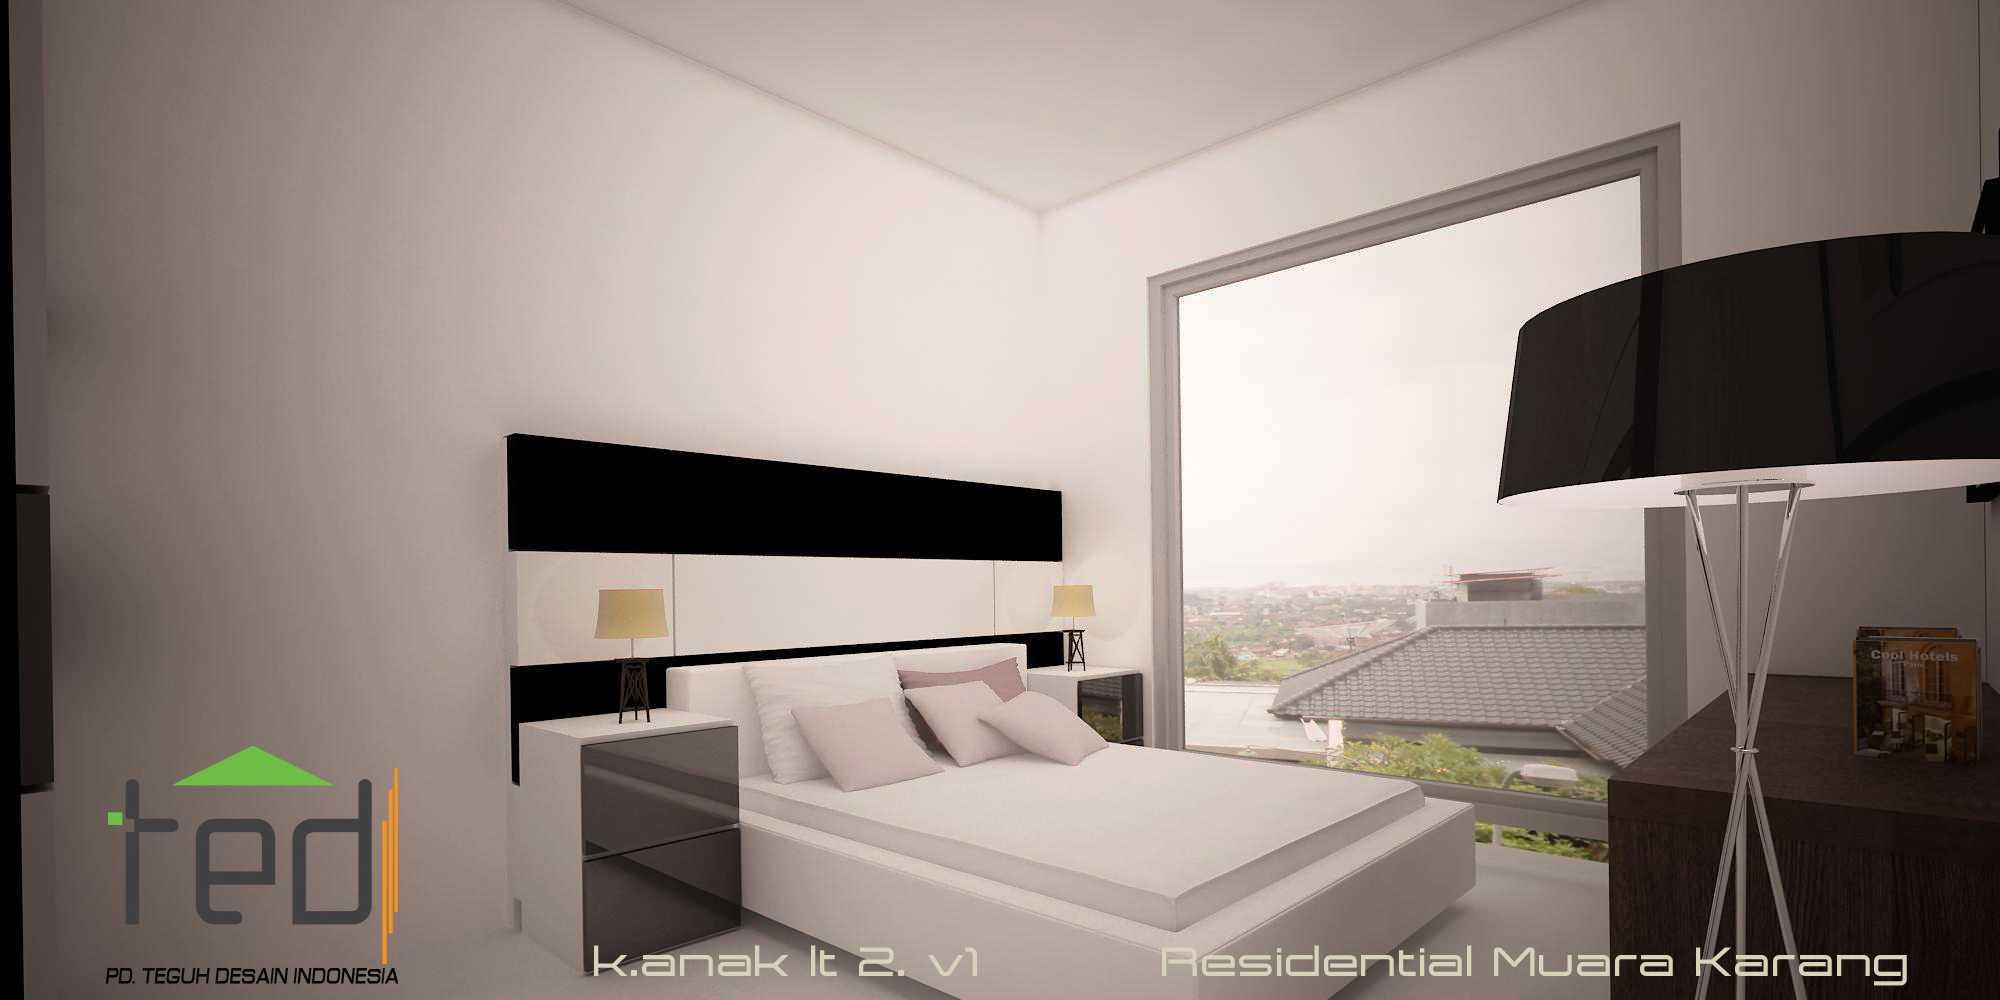 Pd Teguh Desain Indonesia Muara Karang Residence Jakarta, Indonesia Jakarta, Indonesia K Modern  35115